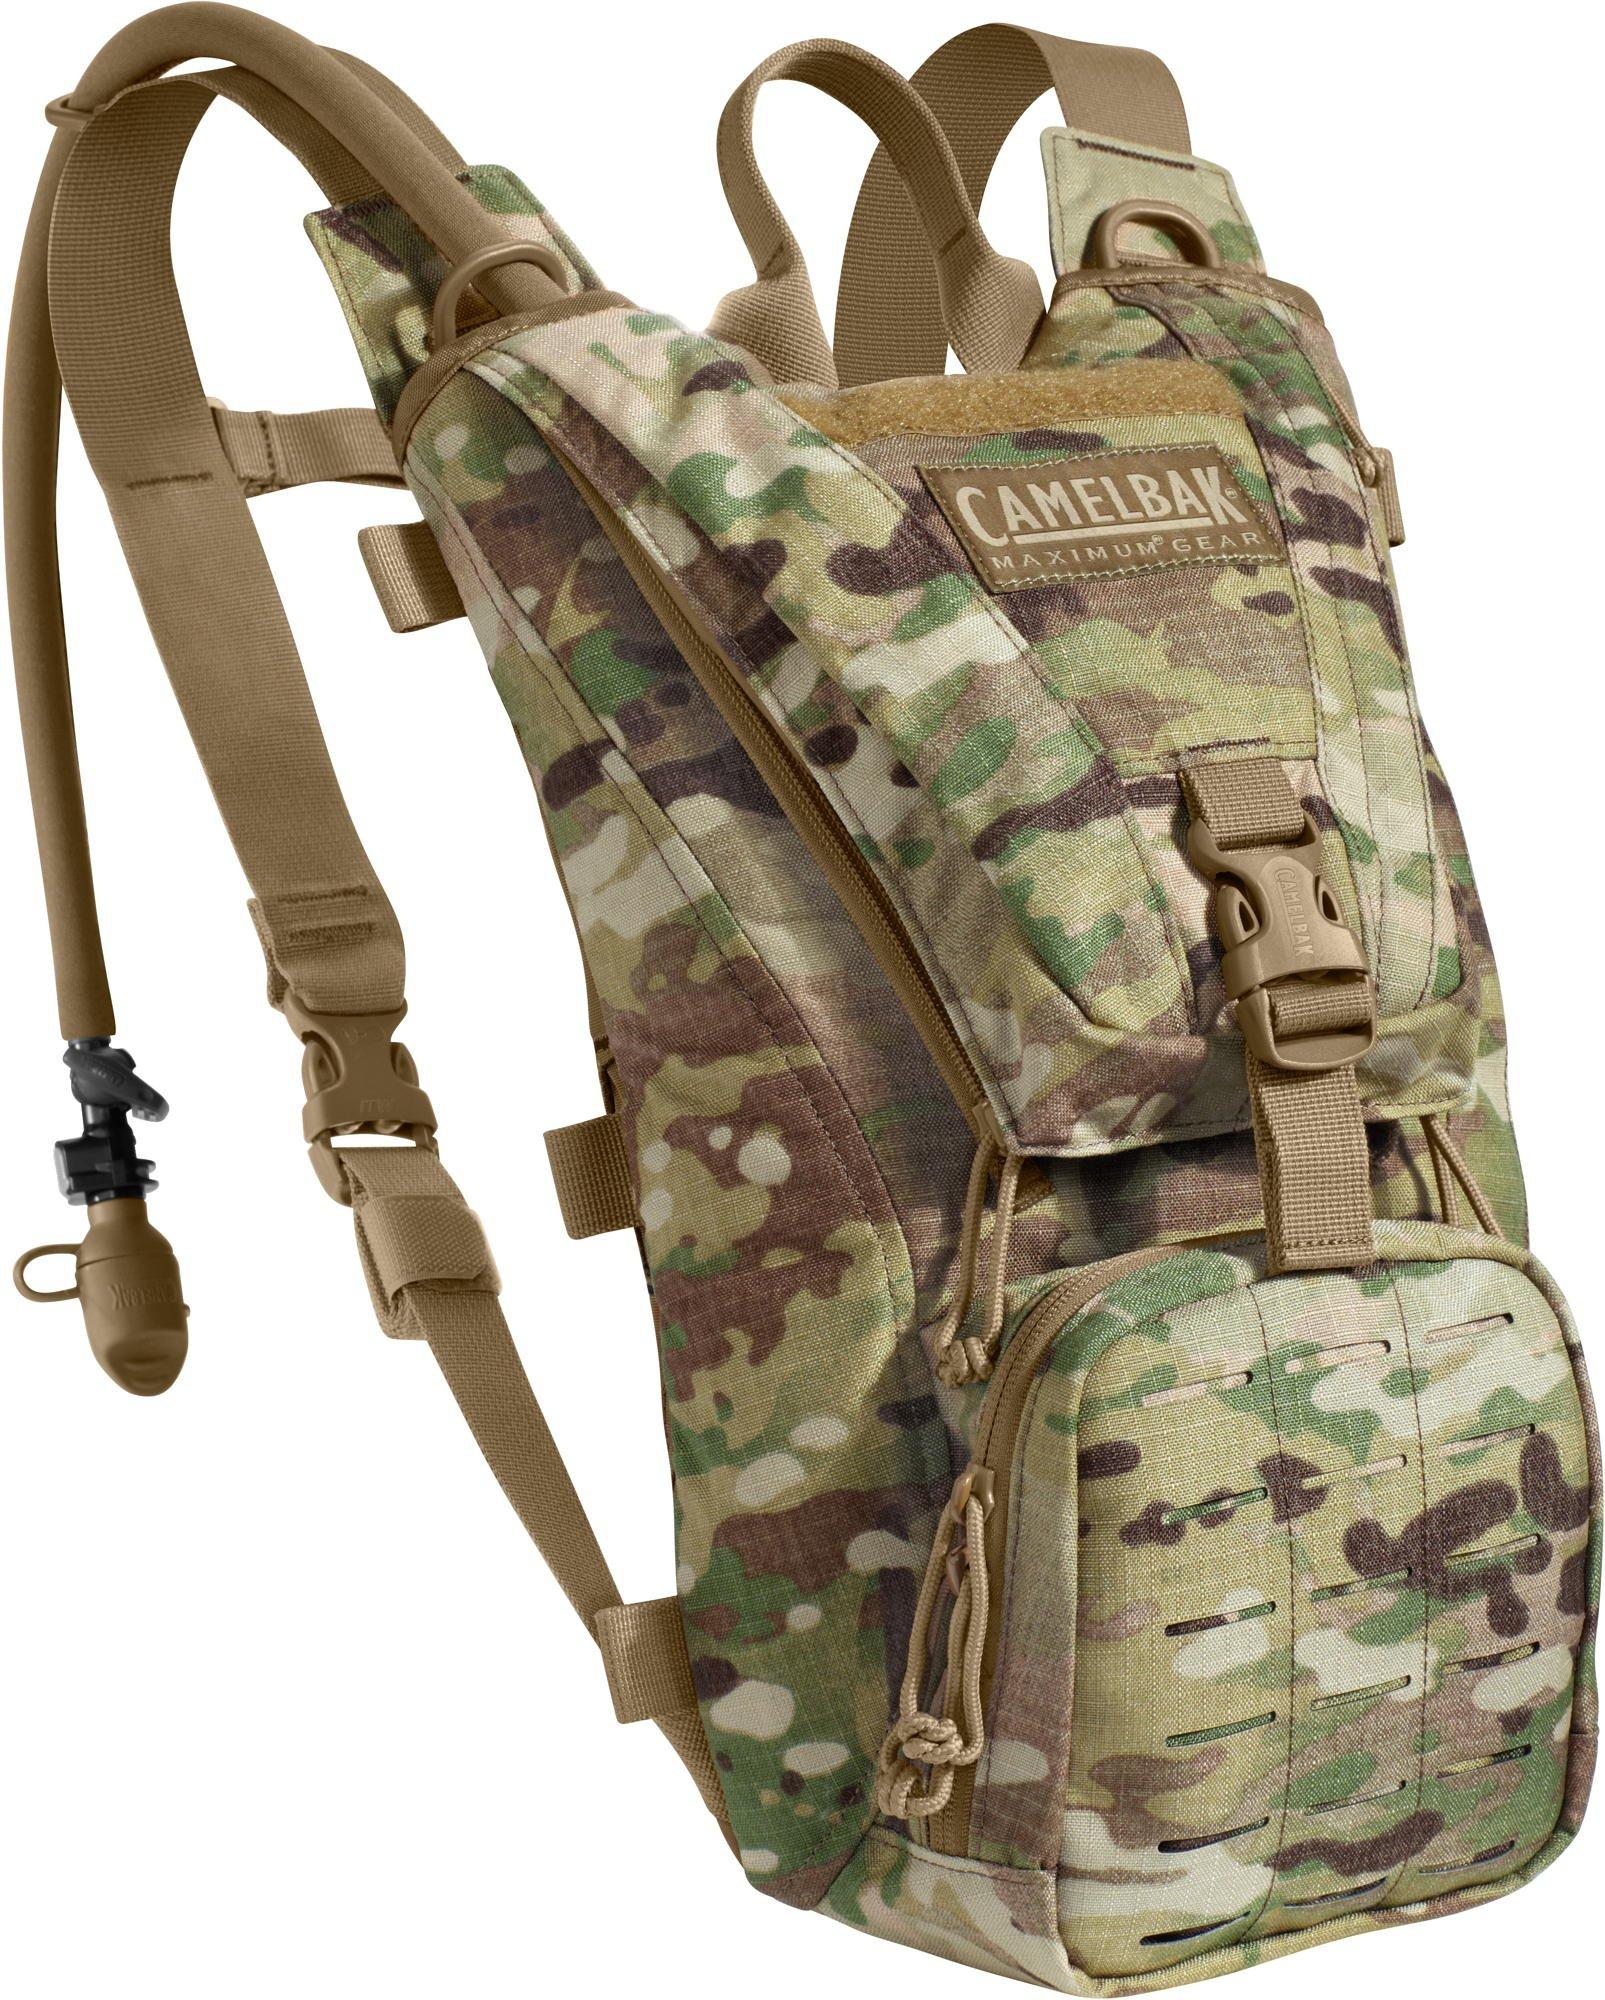 CamelBak Ambush, Multicam (OCP), 100oz/3.0L, 62589 (2015 Model)